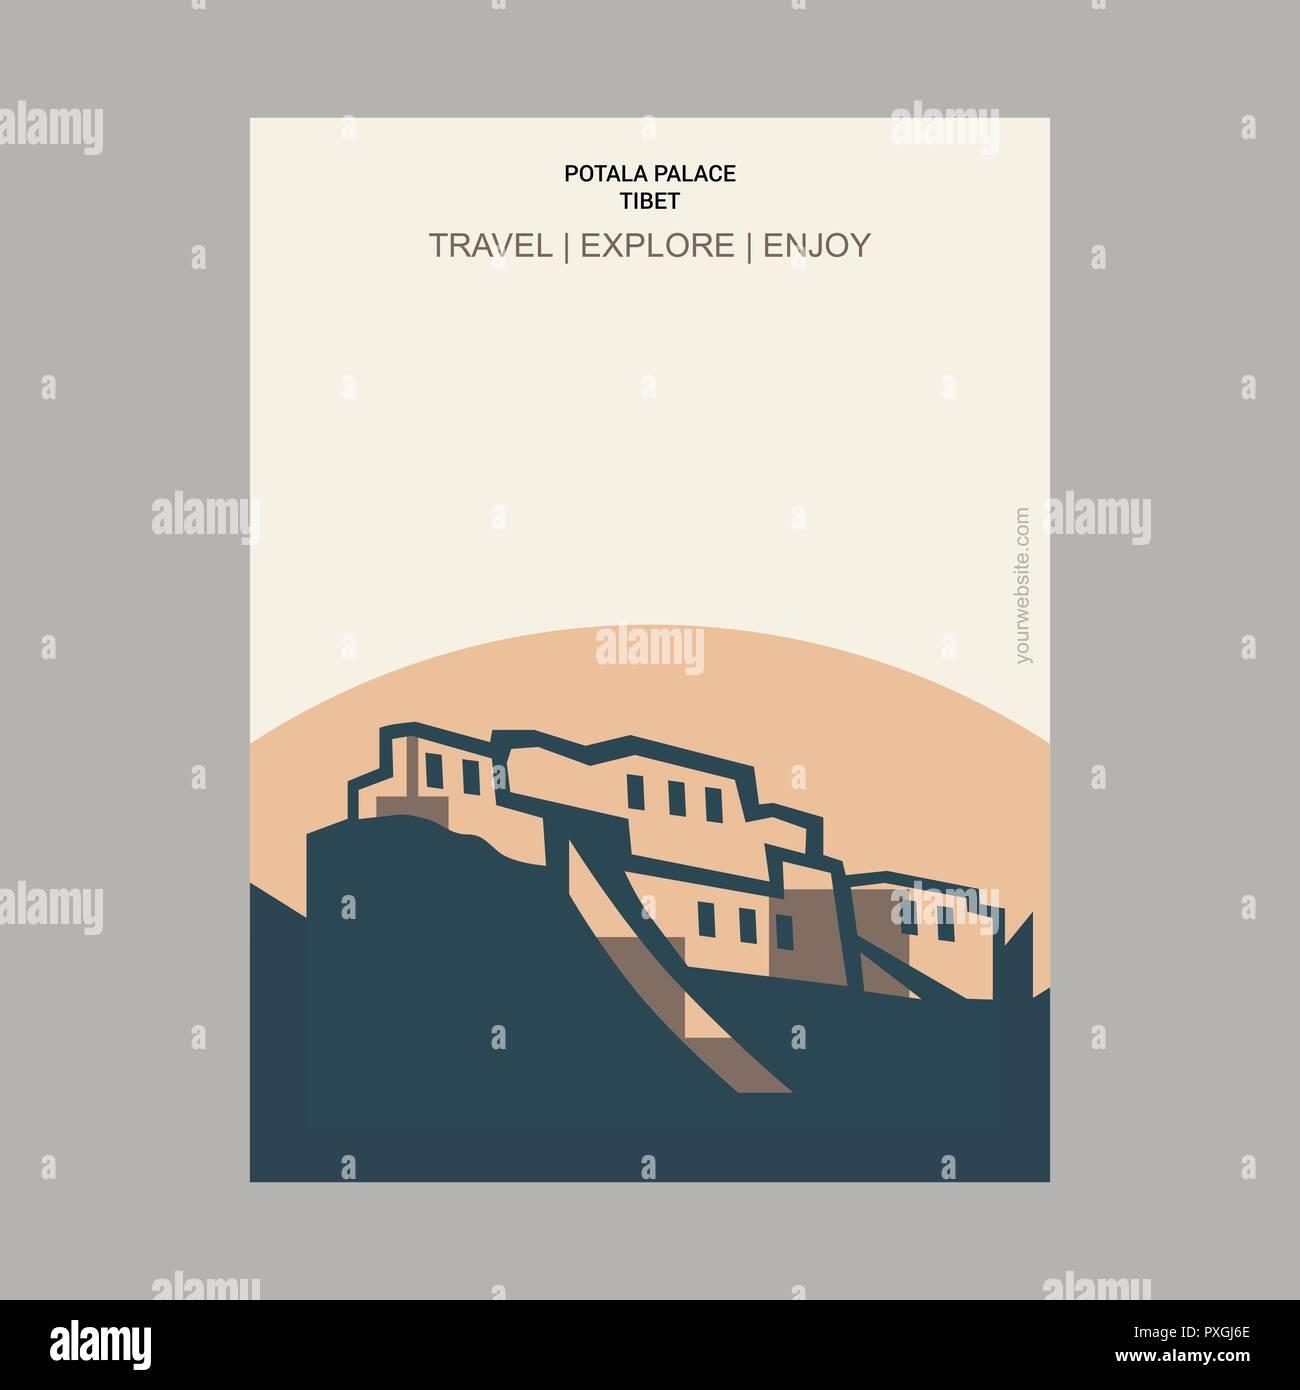 Potala Palace, Tibet Vintage Style Landmark Poster Template - Stock Vector